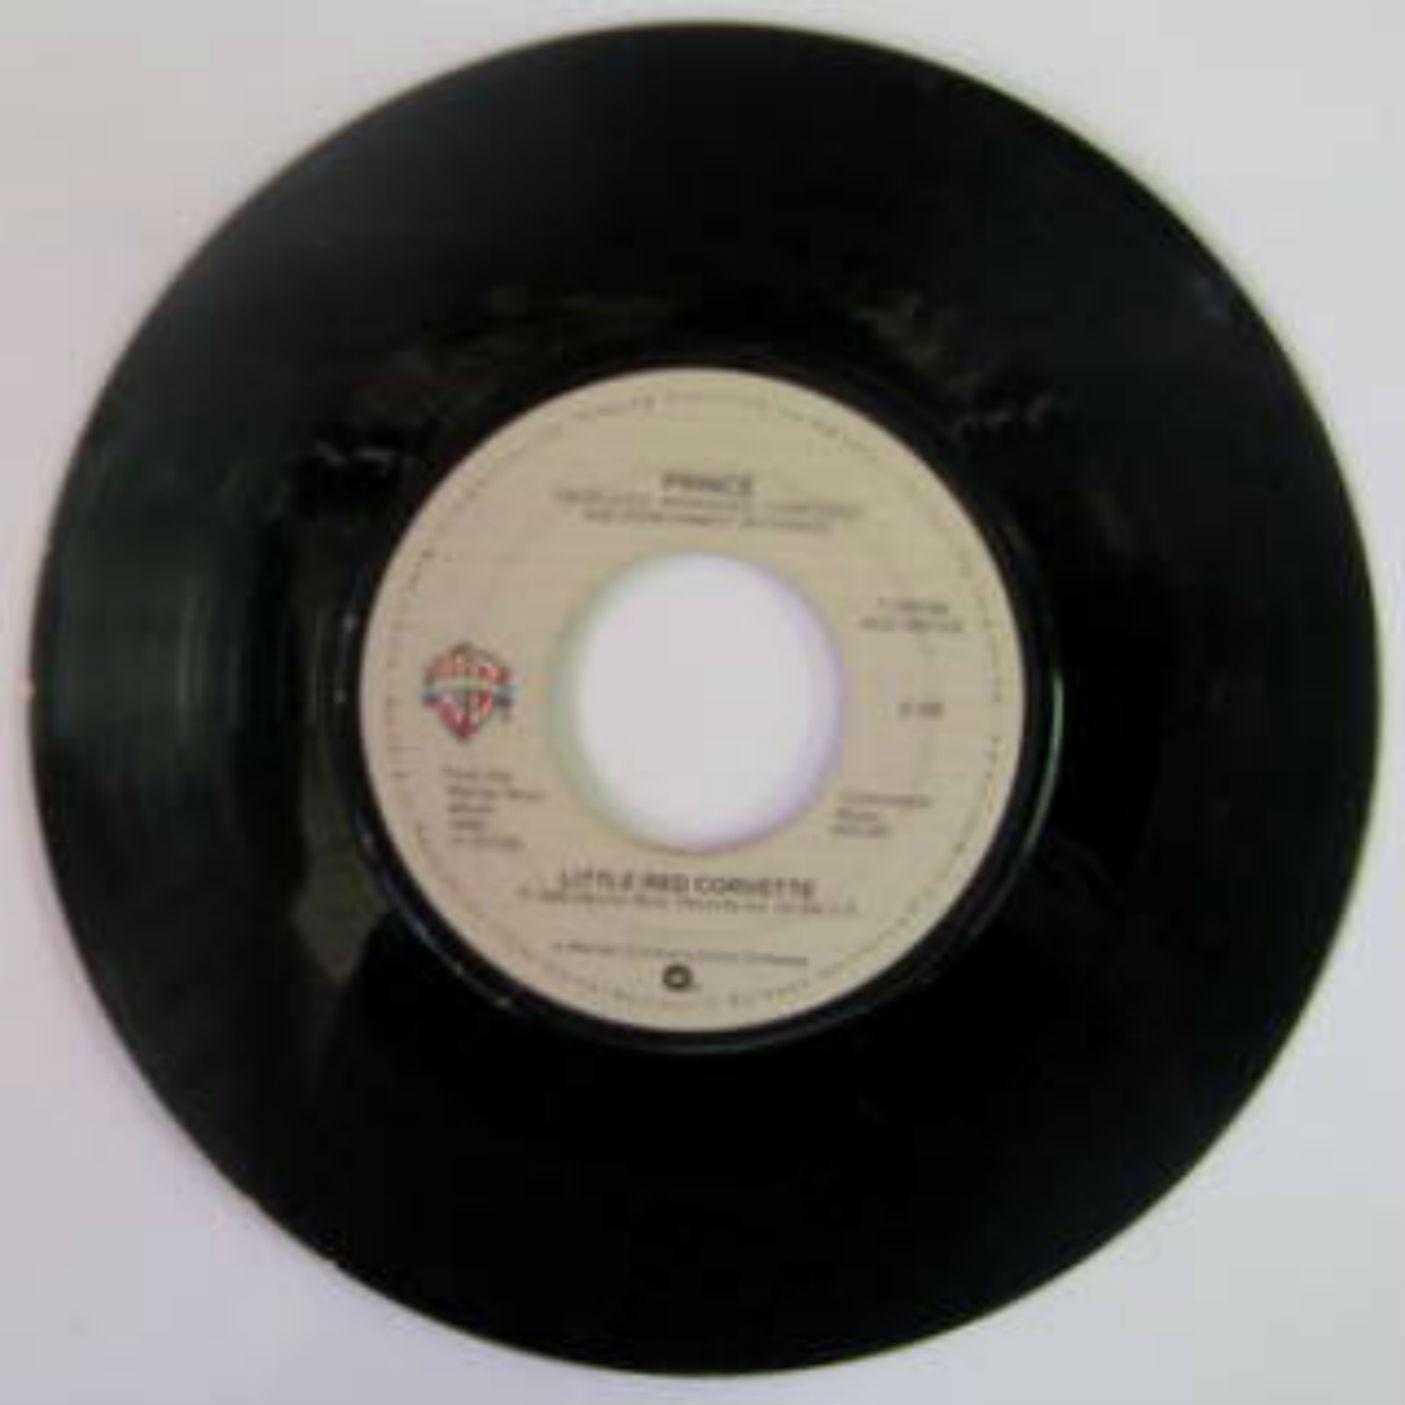 Prince Little Red Corvette Vinyl Records Lp Cd On Cdandlp